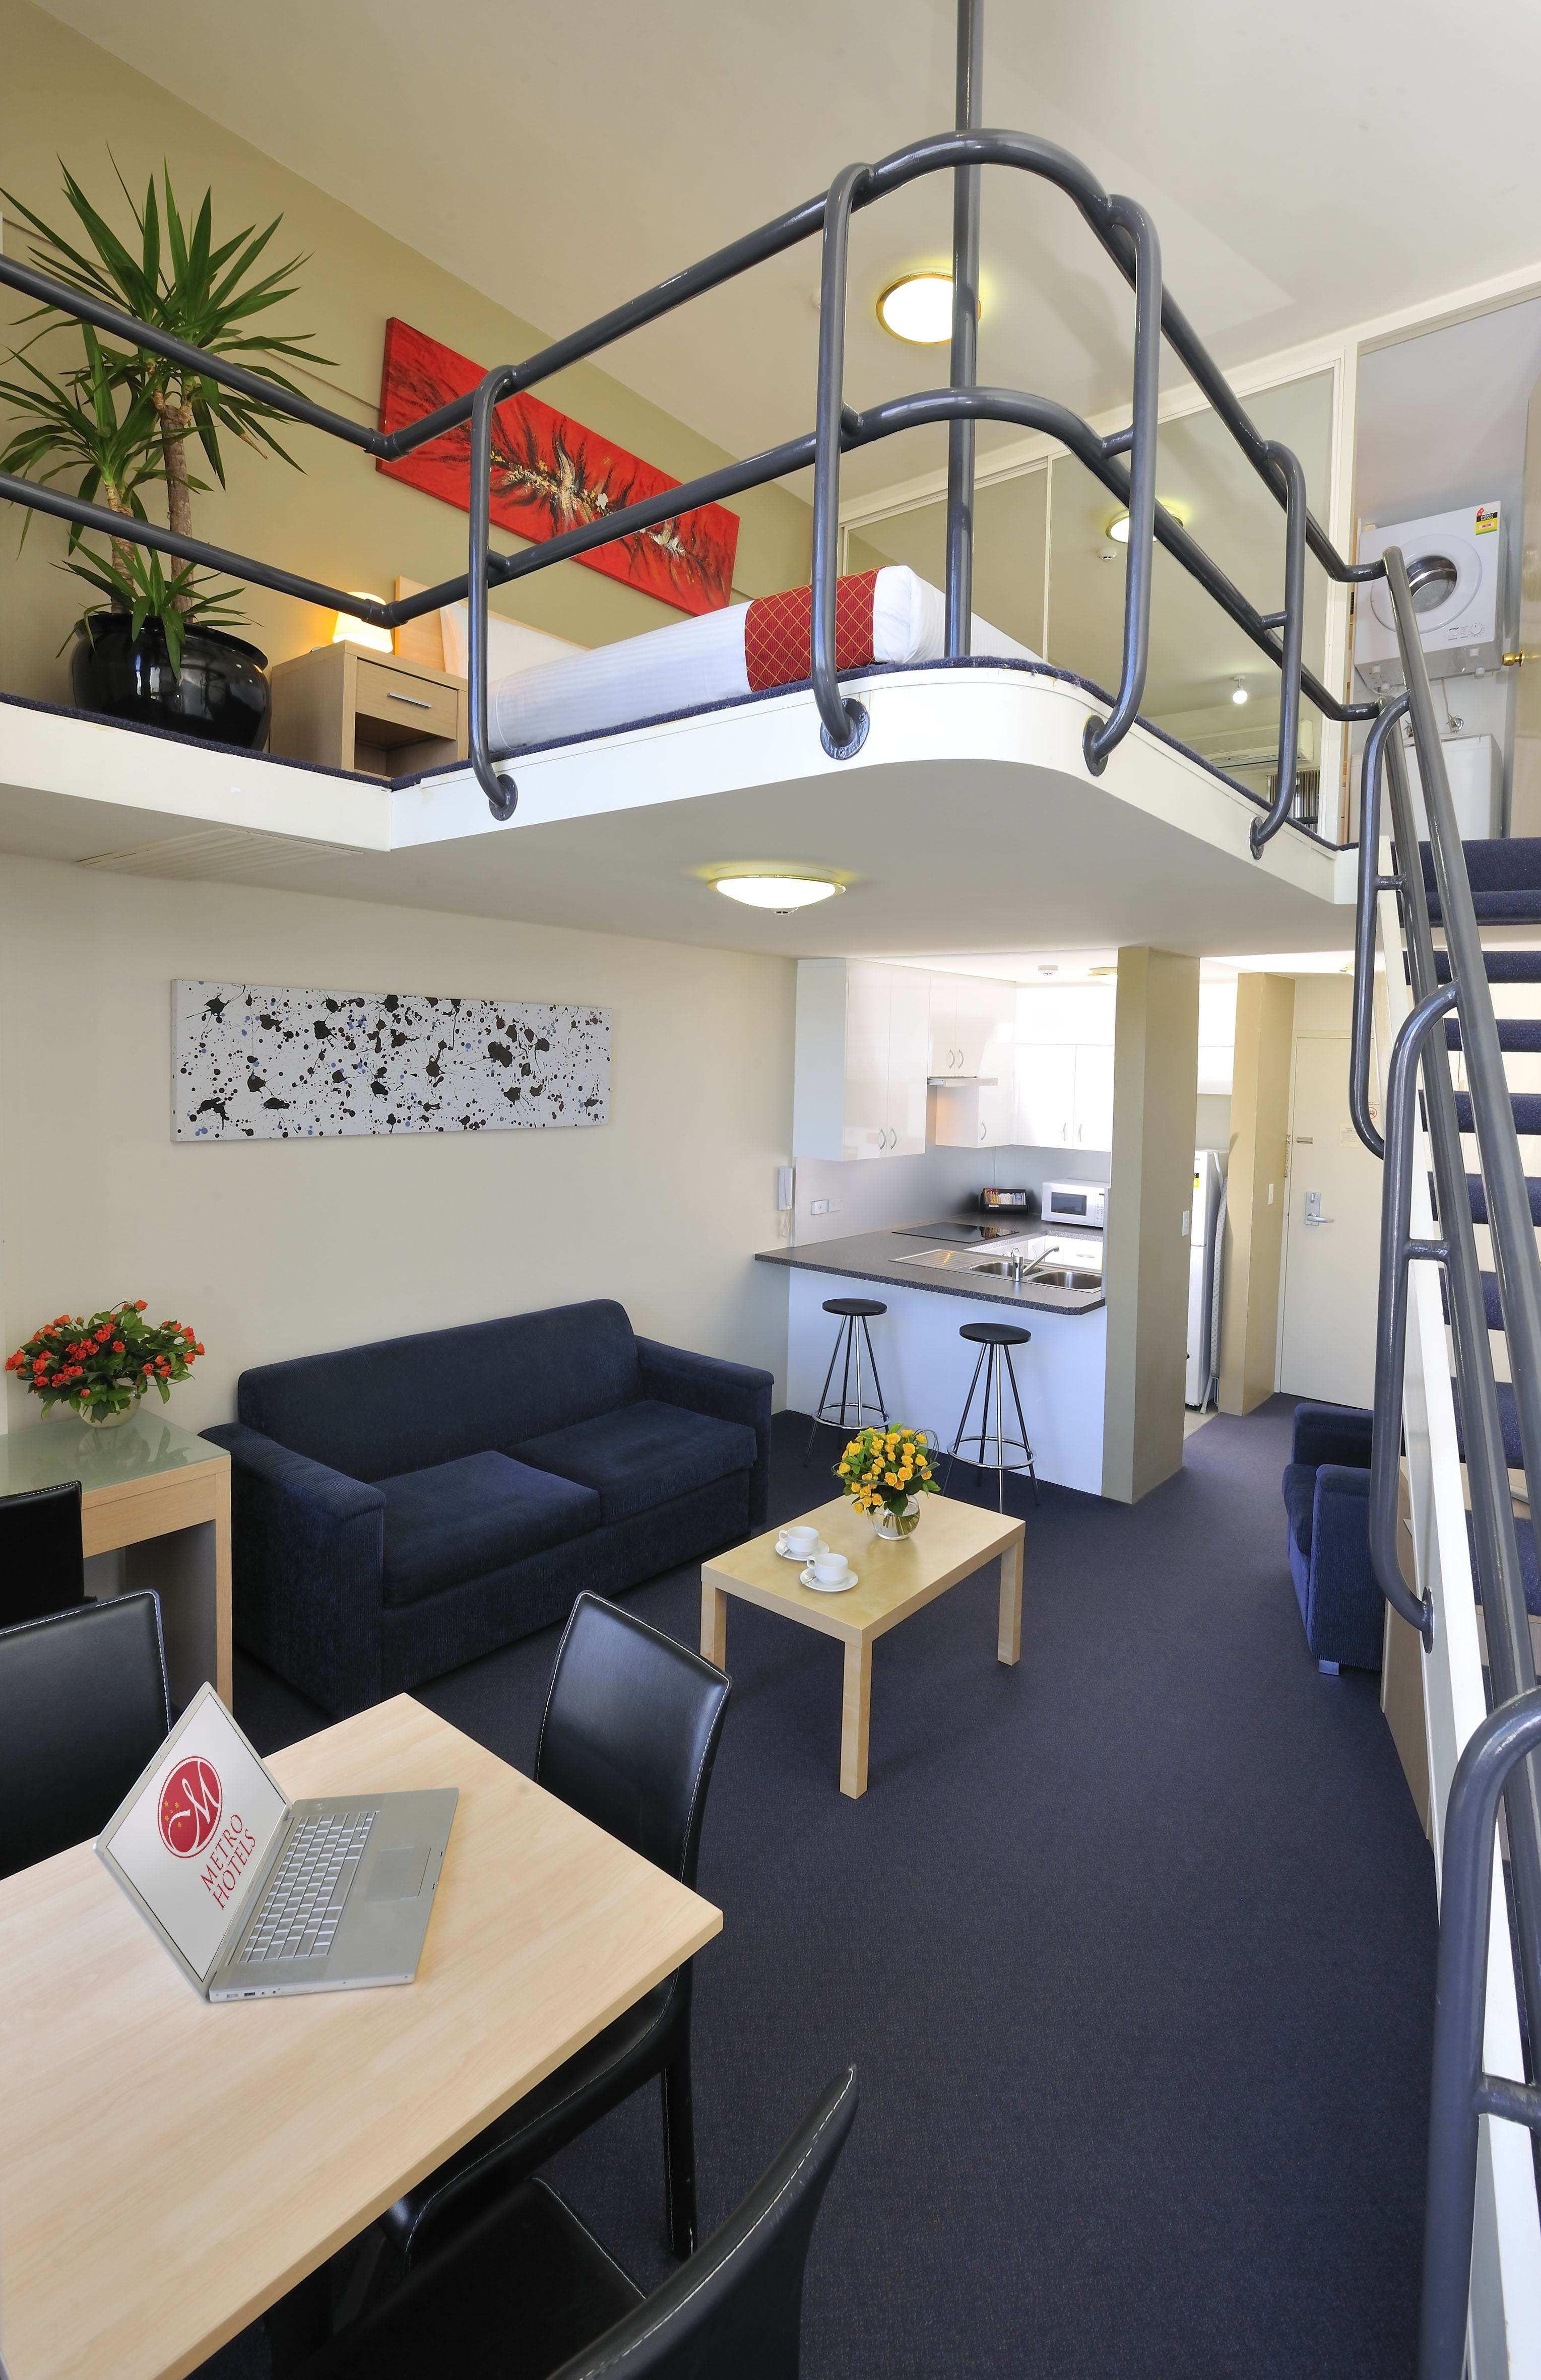 Explore Loft Studio Plan And More